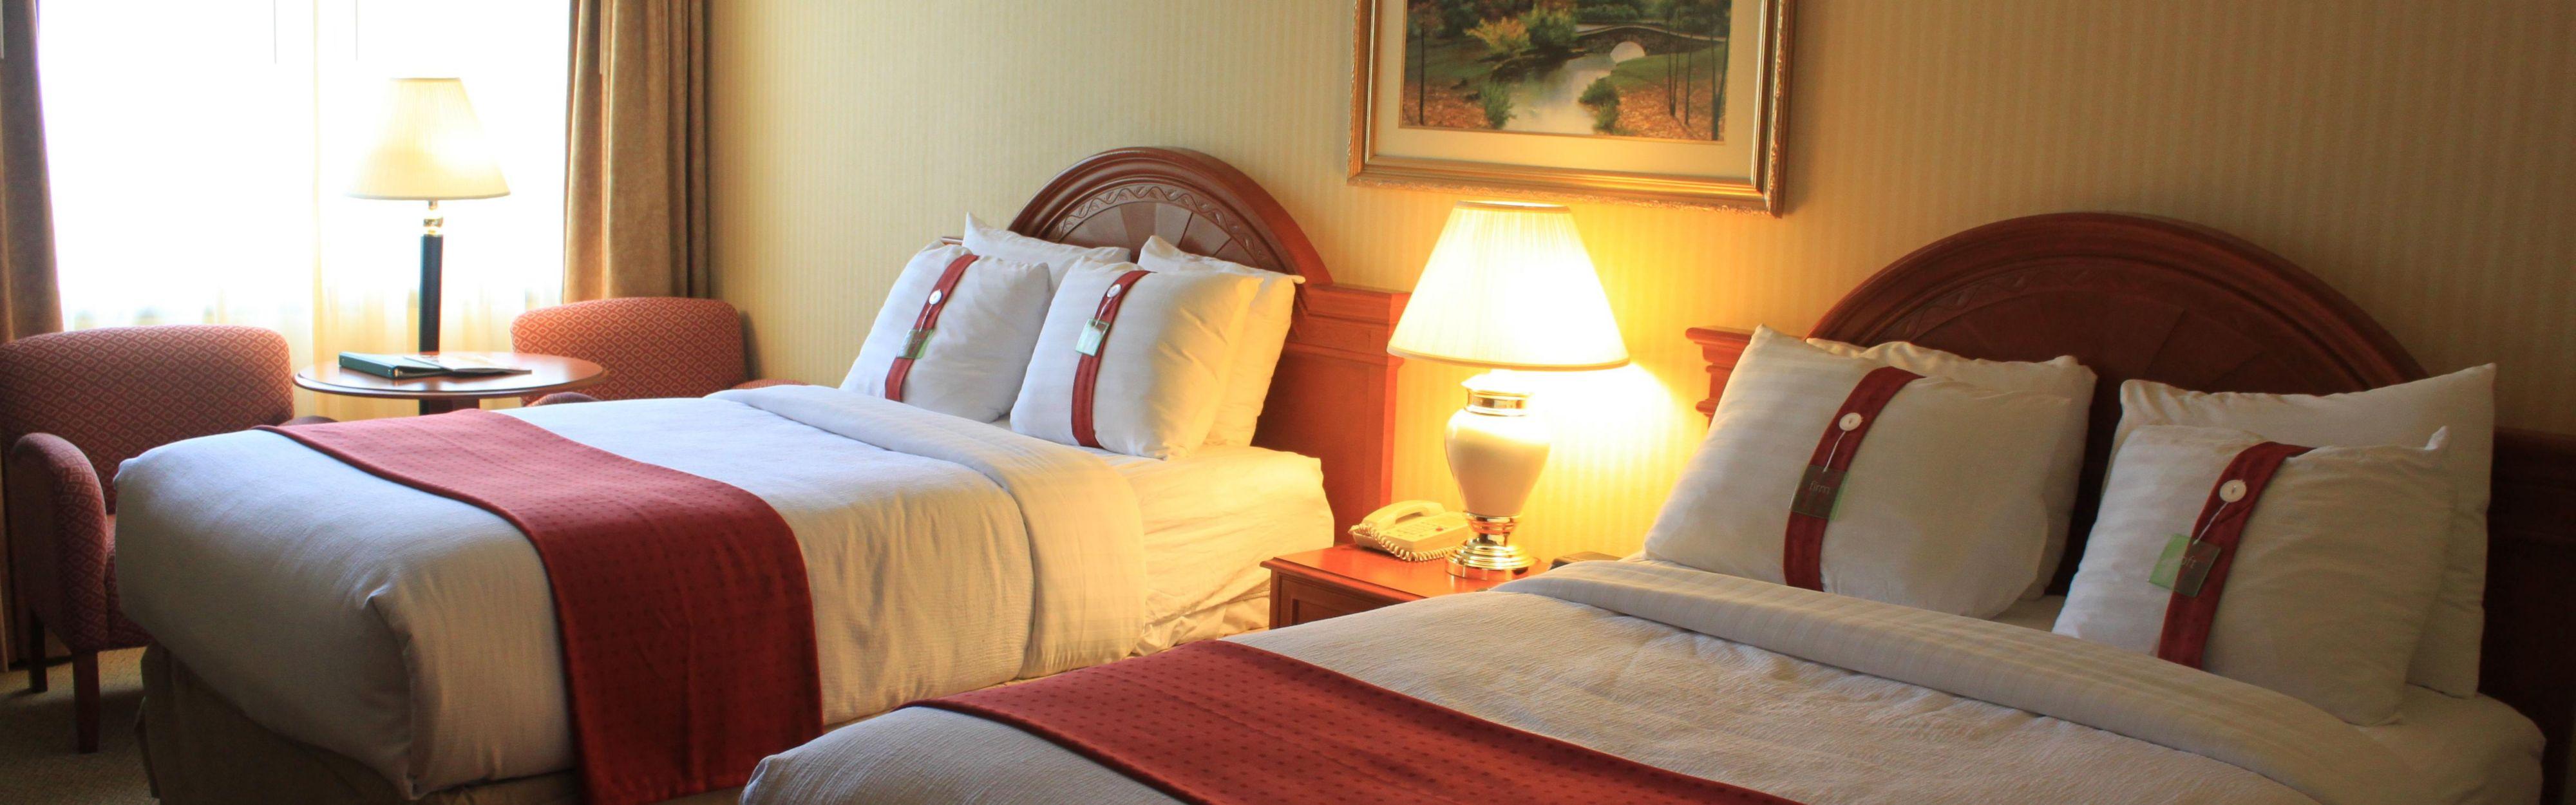 Goshen In Hotels And Motels